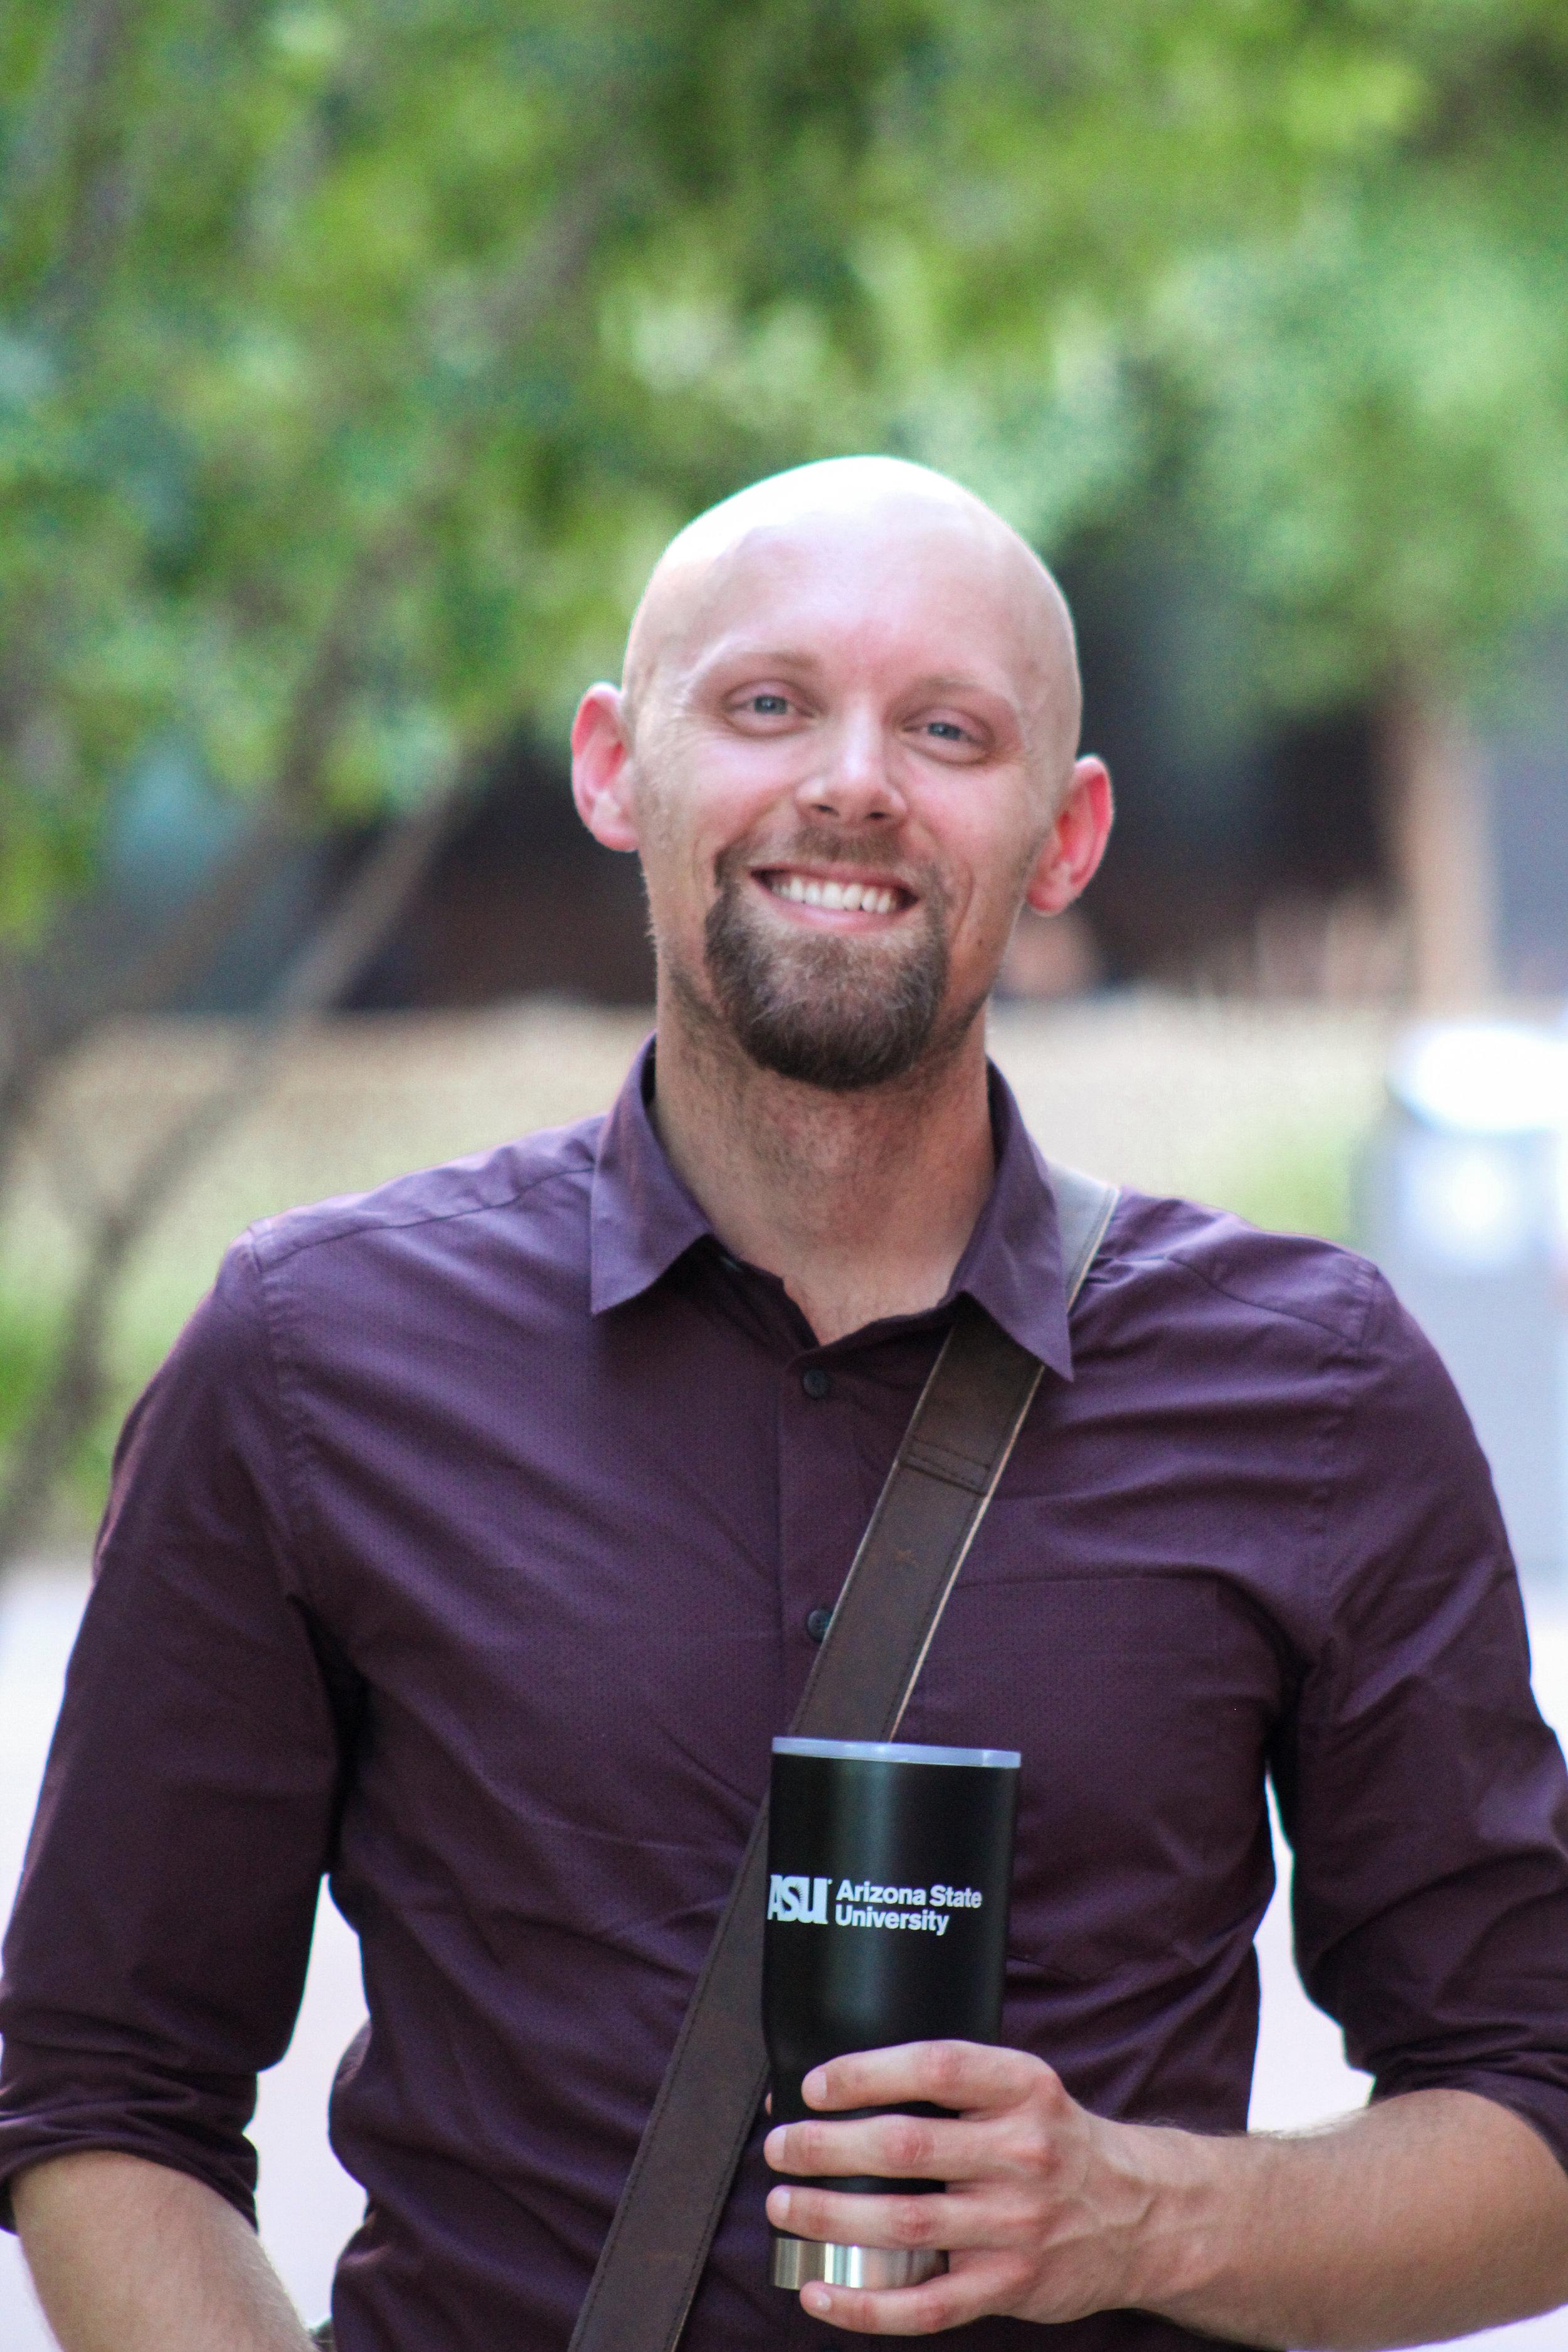 Bradley Bolin |  NRHH Advisor  | Bradley.Bolin@asu.edu